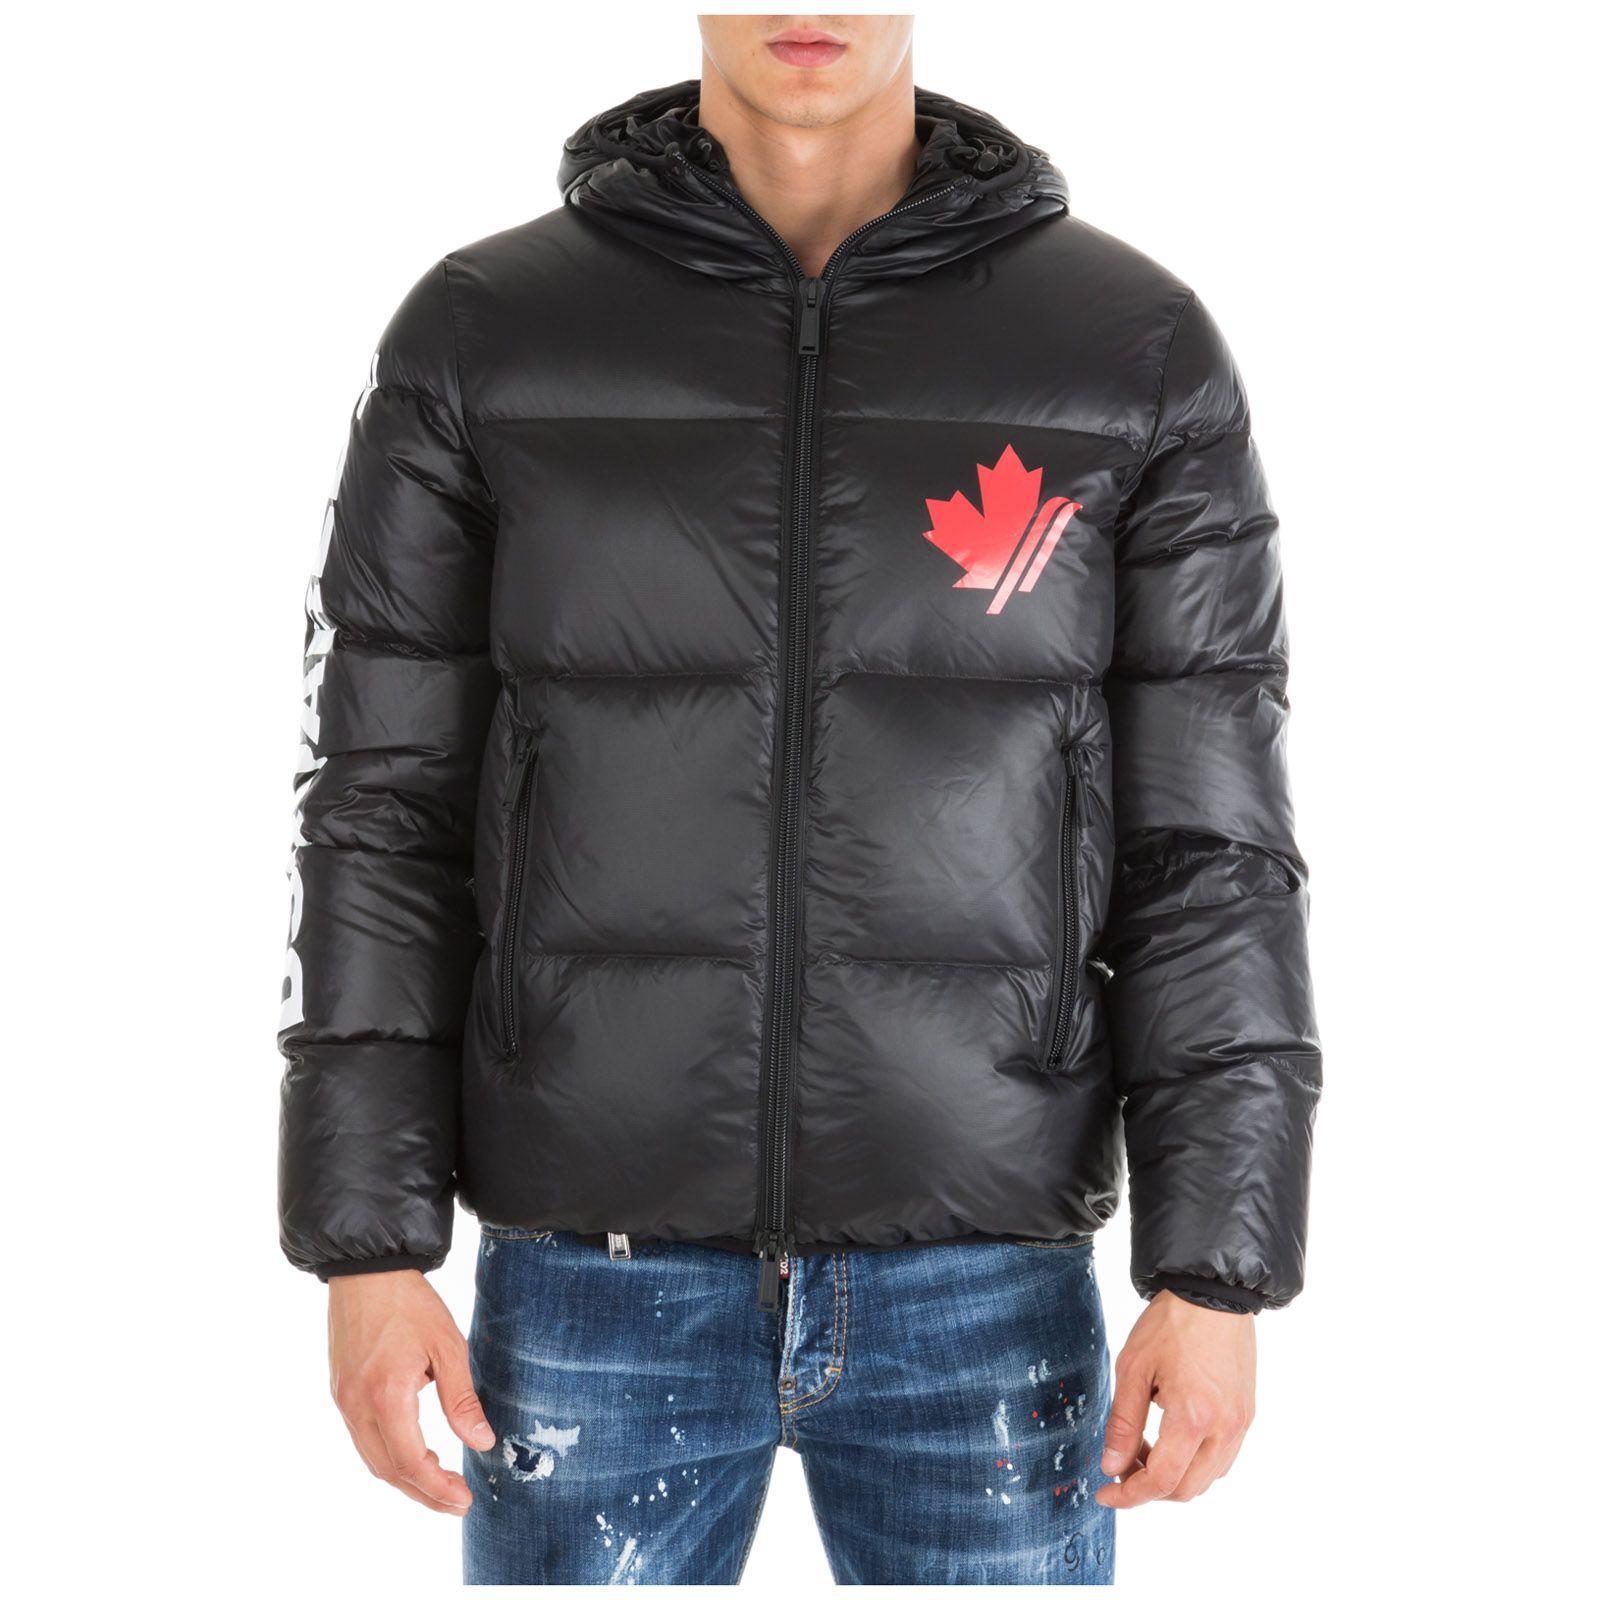 Dsquared2 Men S Outerwear Down Jacket Blouson Hood Dsquared2 Cloth Down Jacket Jackets Mens Jackets [ 1600 x 1600 Pixel ]